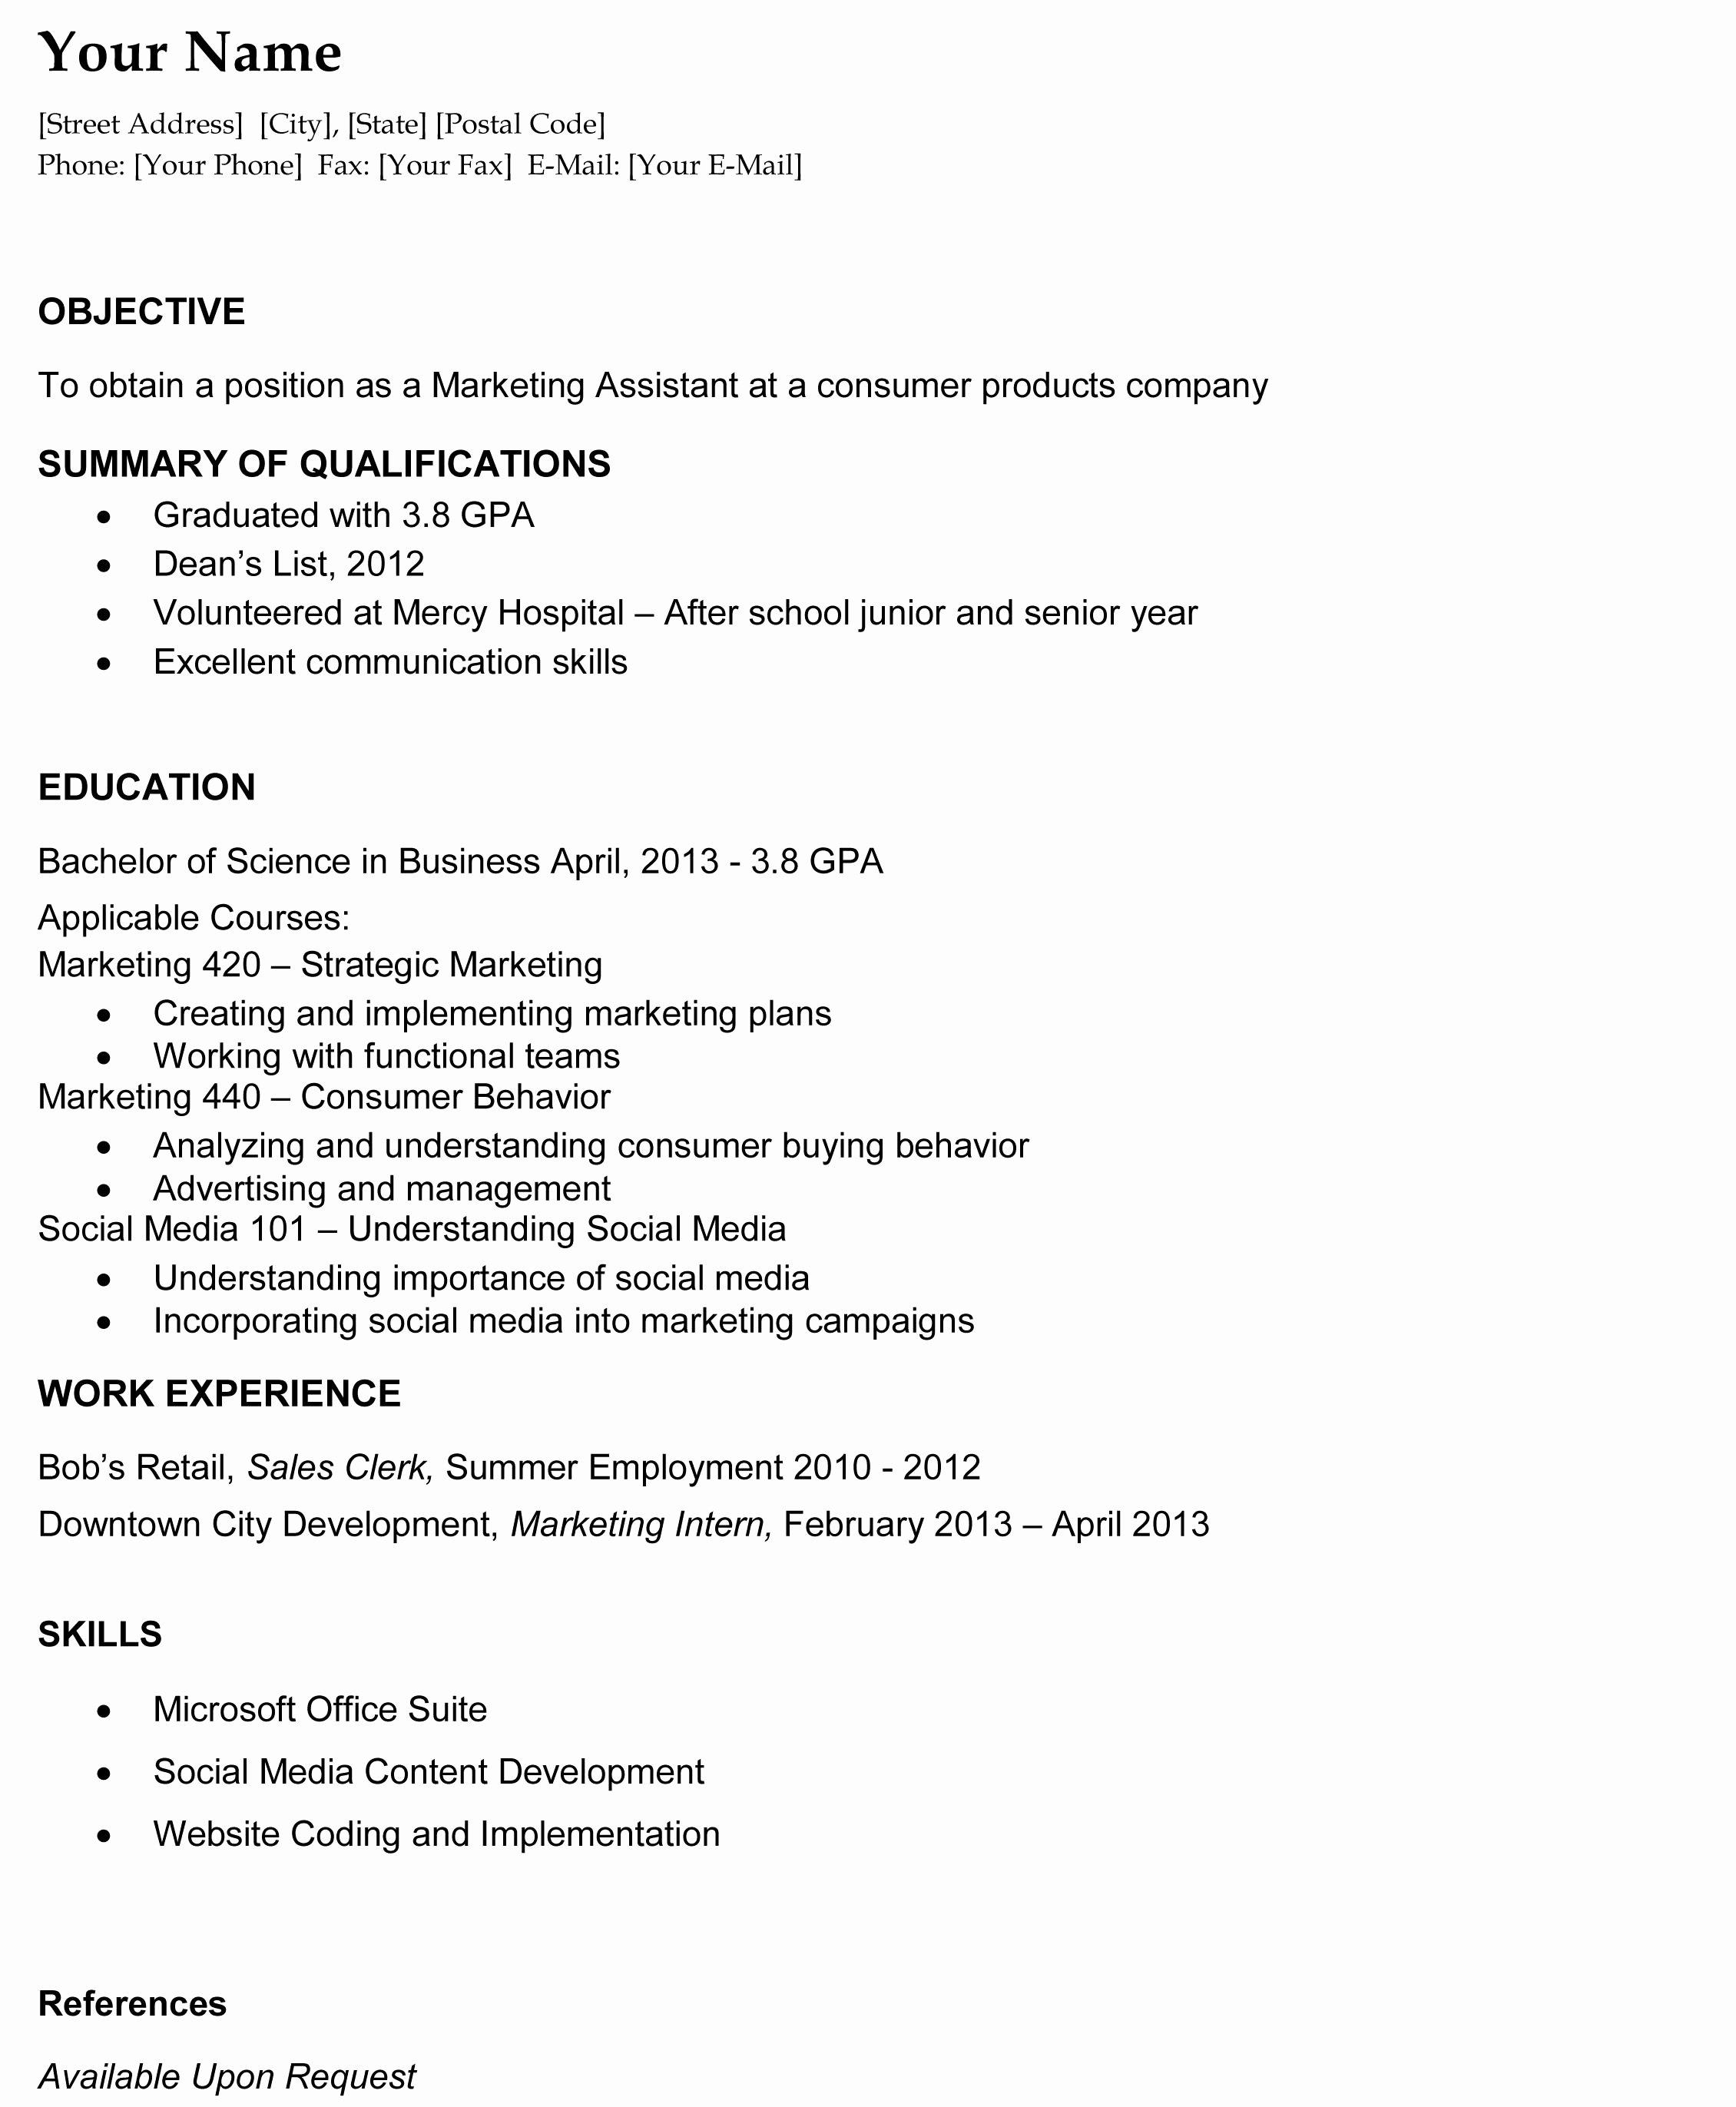 Resume format Resume Templates University